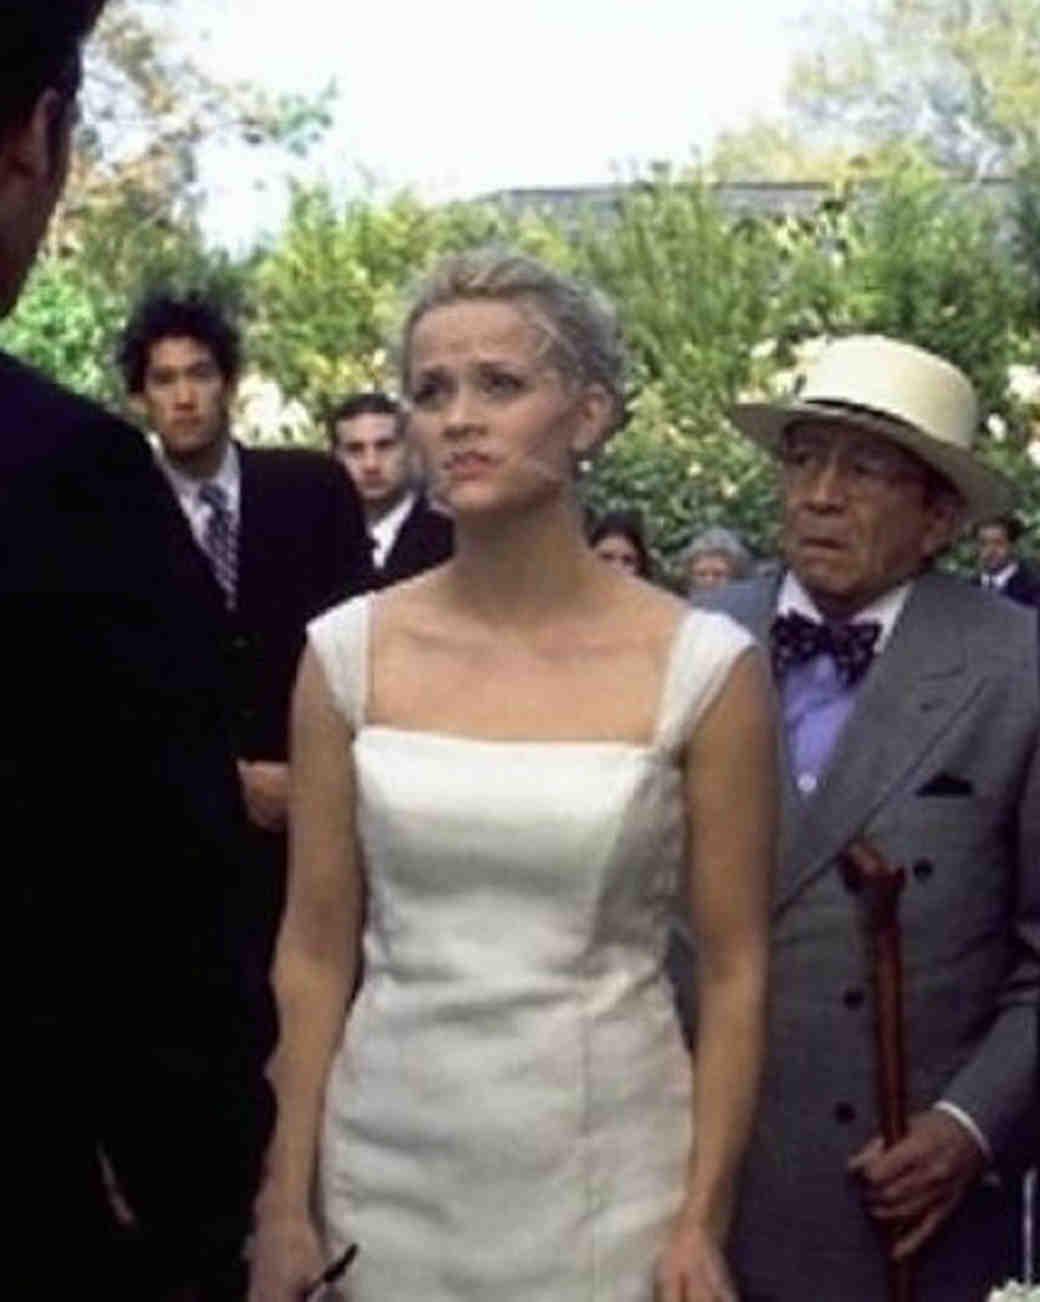 movie-wedding-dresses-sweet-home-alabama-reese-witherspoon-0316.jpg